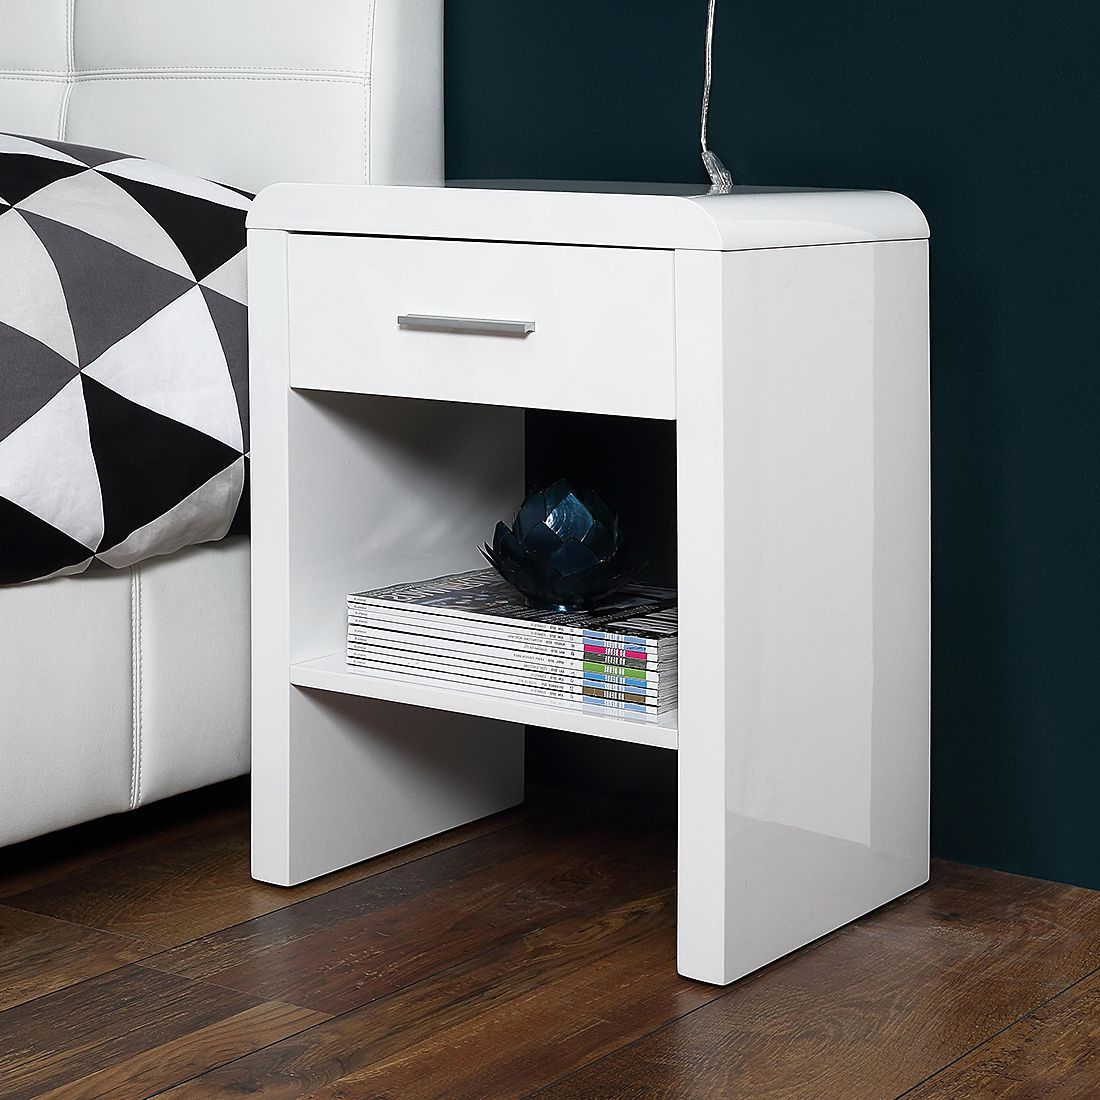 Nachtkonsole Easy – Weiß, roomscape – MAC000505 – Kauf Dir…